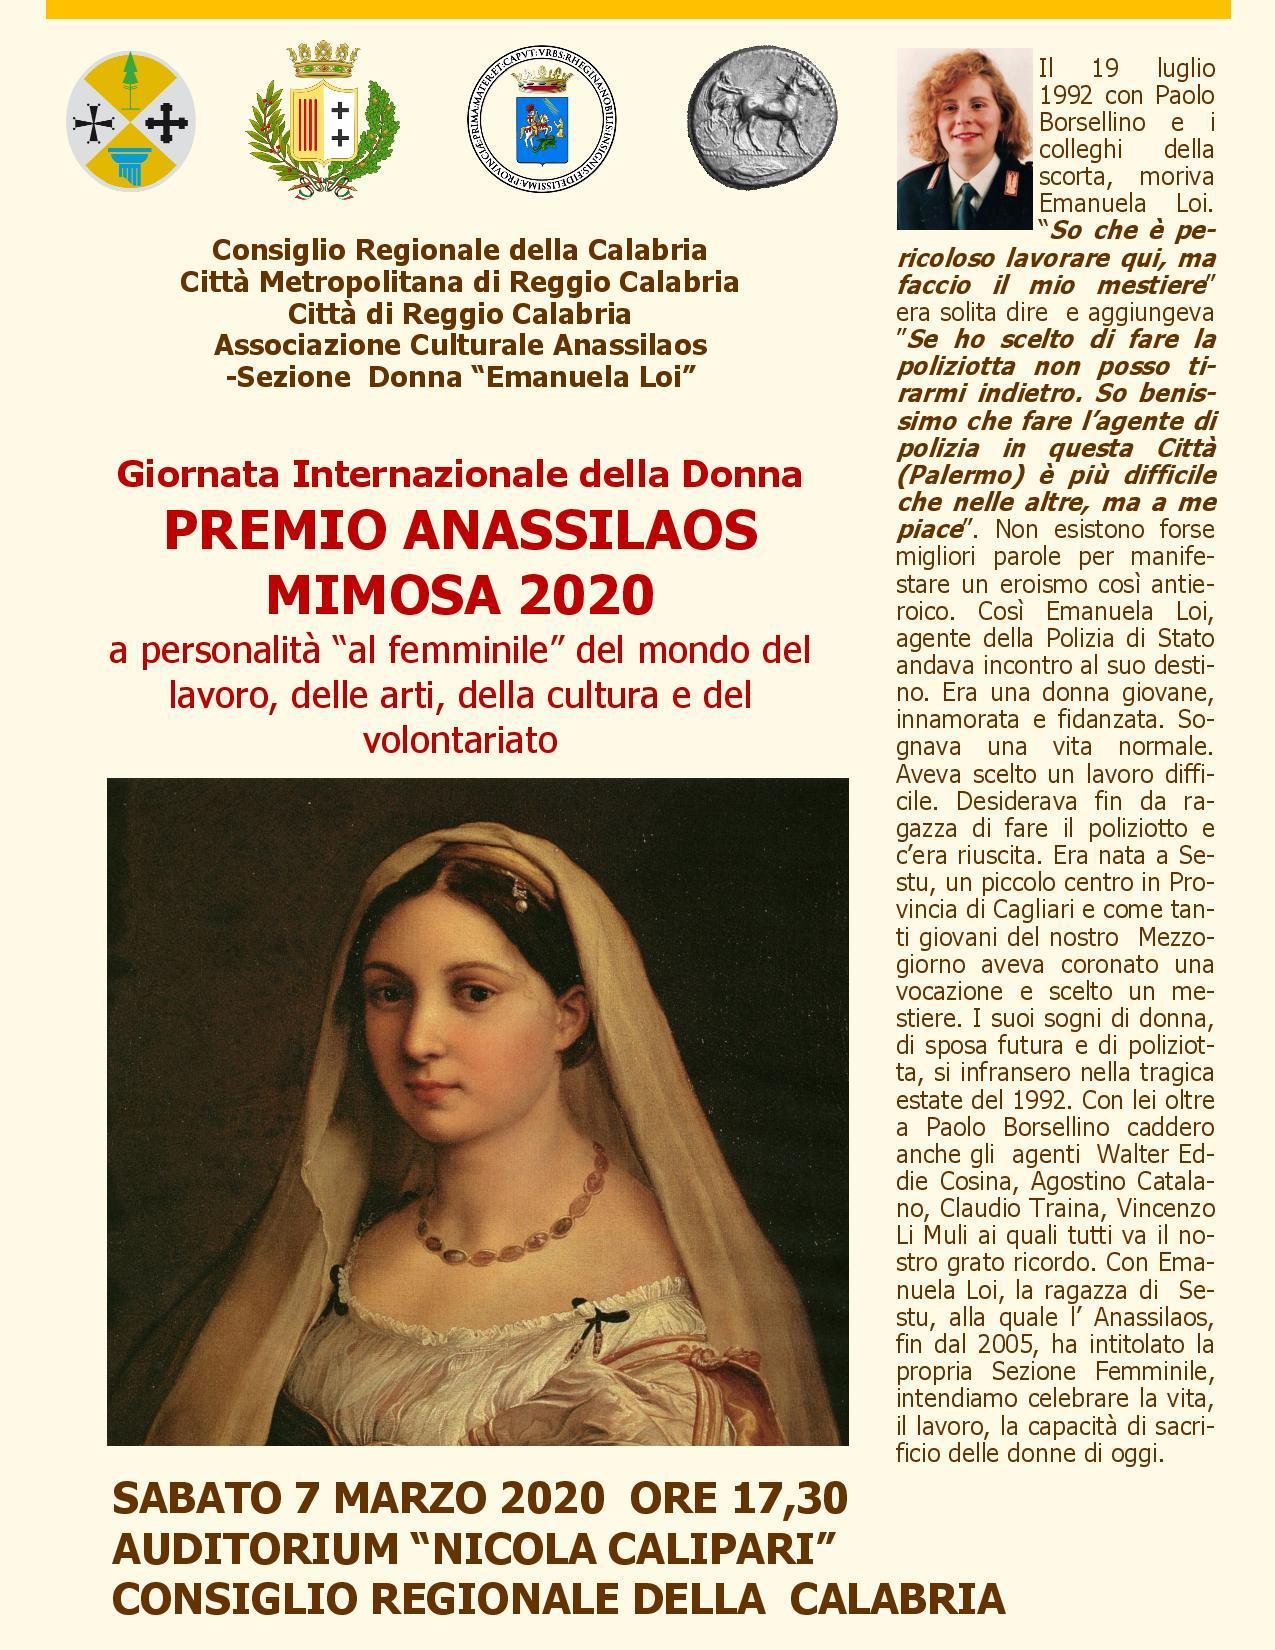 PREMIO ANASSILAOS MIMOSA 2020